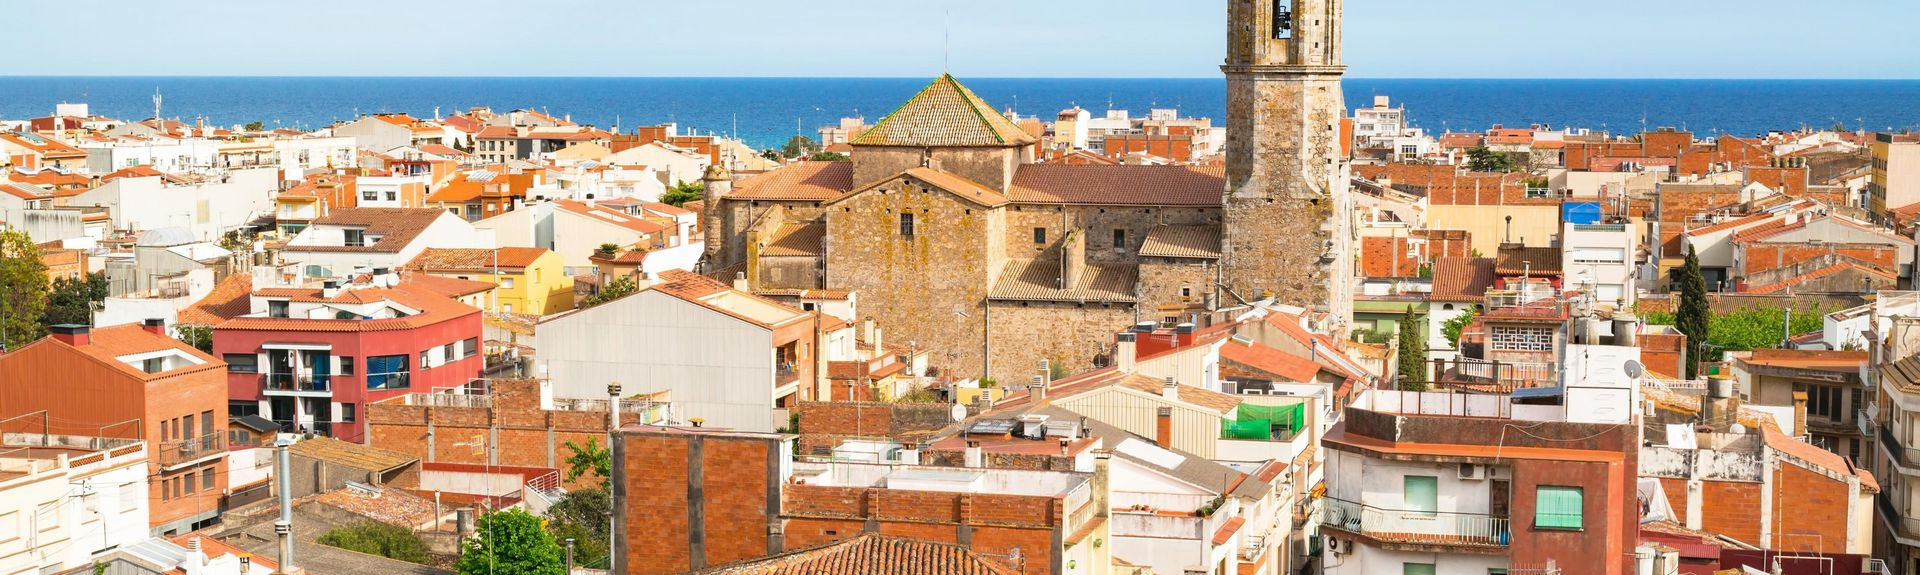 Malgrat de Mar, Catalonia, Spain